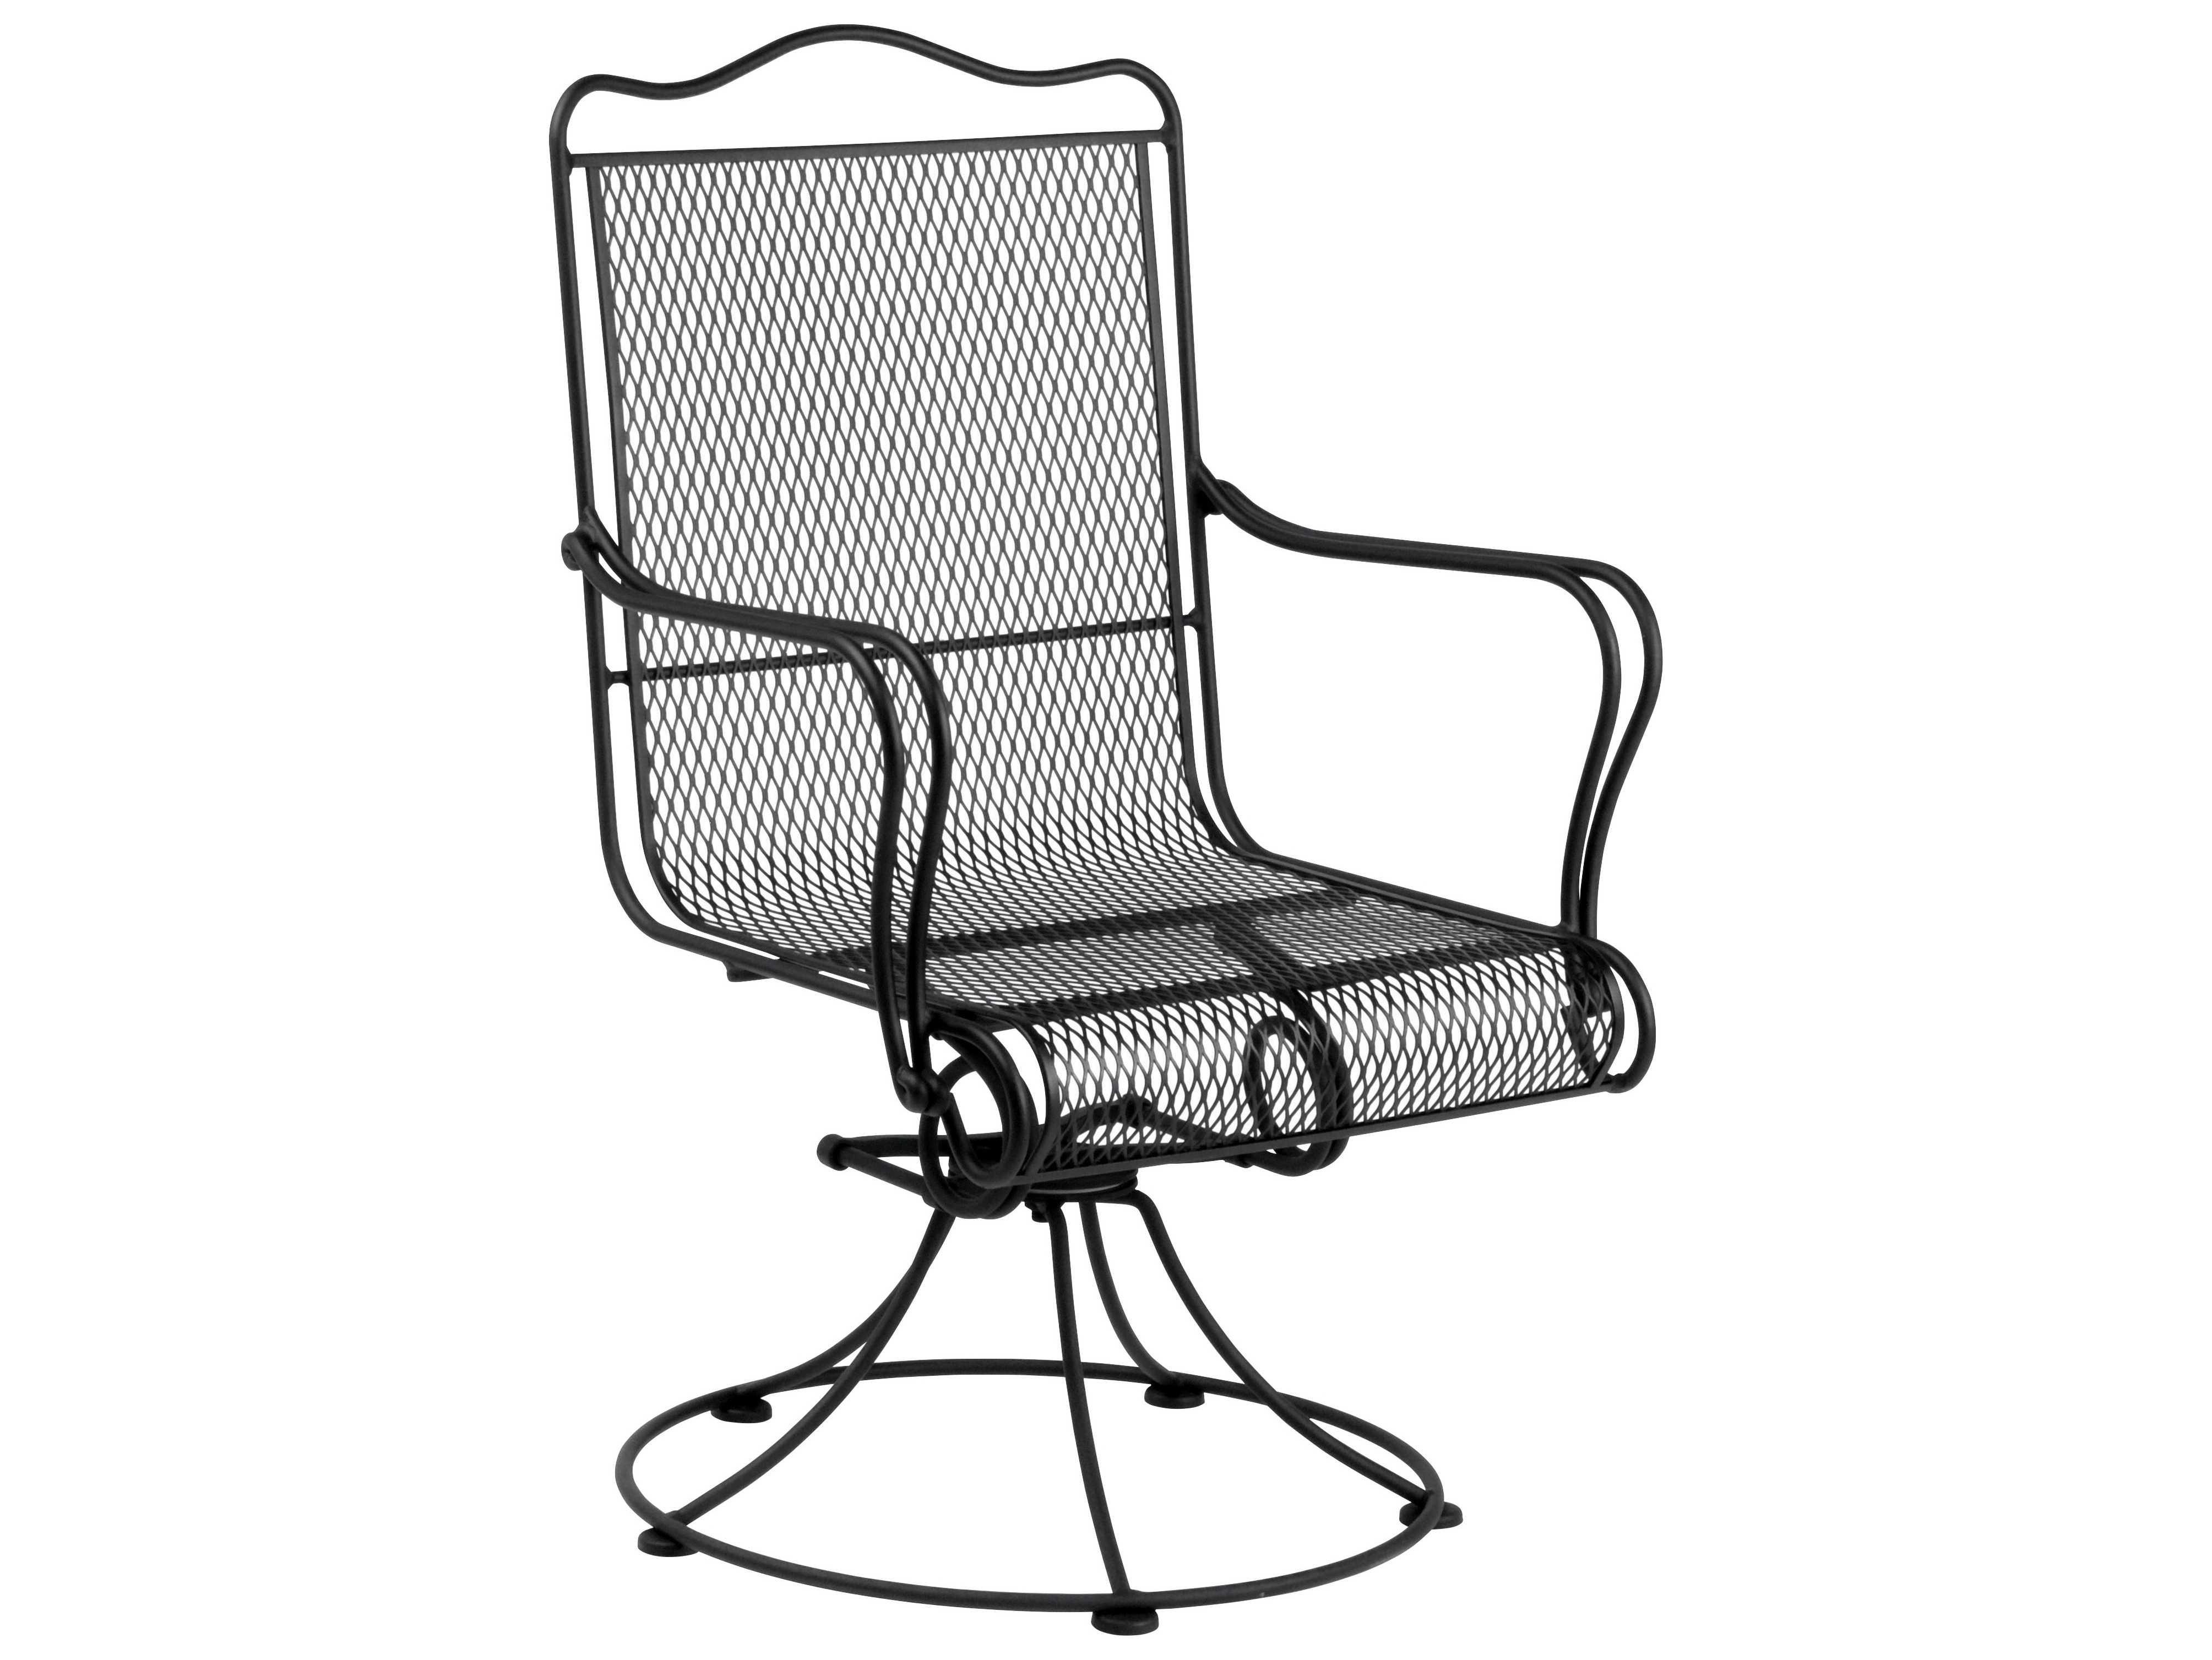 Woodard tucson wrought iron high back swivel rocker dining for Iron patio chairs